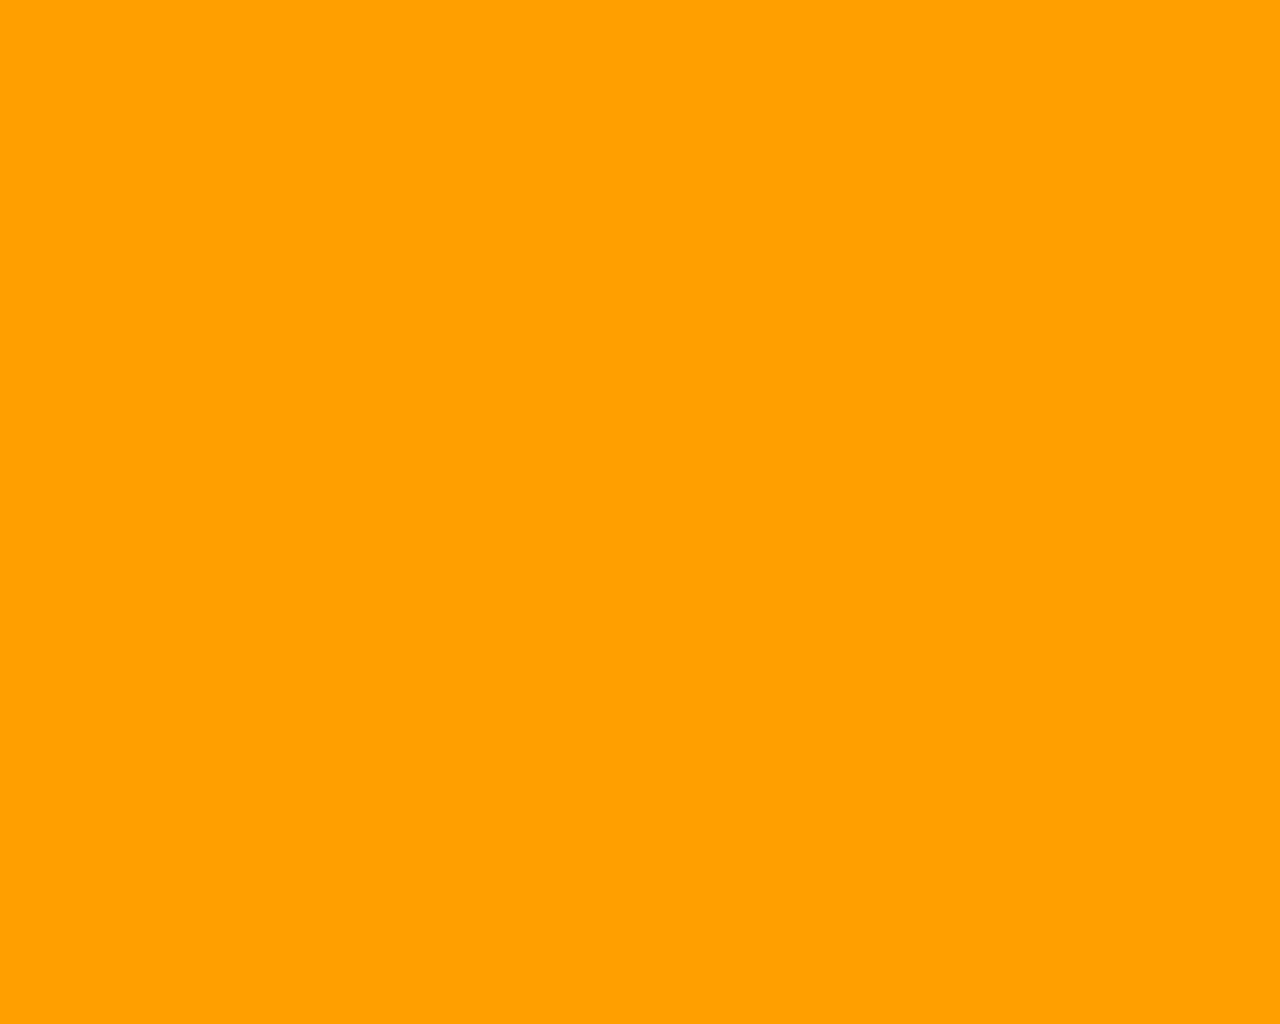 1280x1024 Orange Peel Solid Color Background